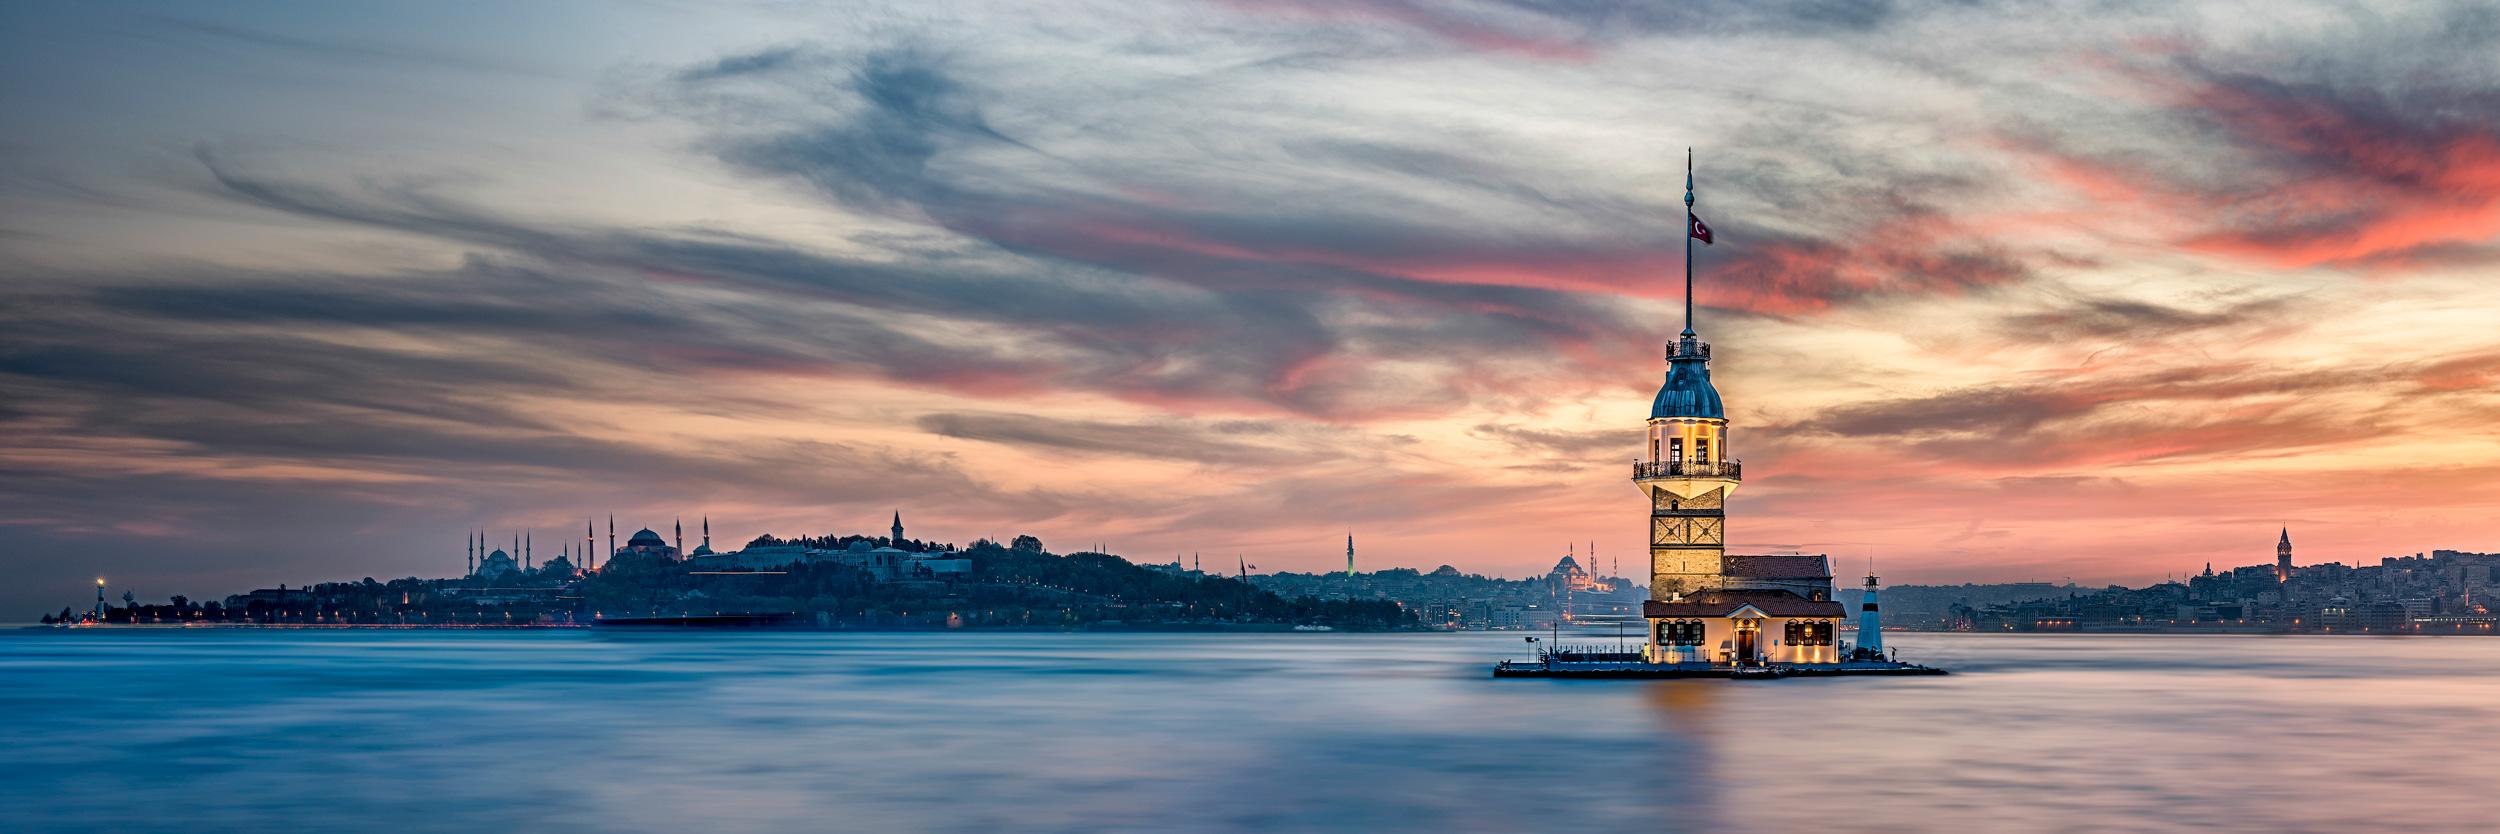 istanbul-detail-image.jpg